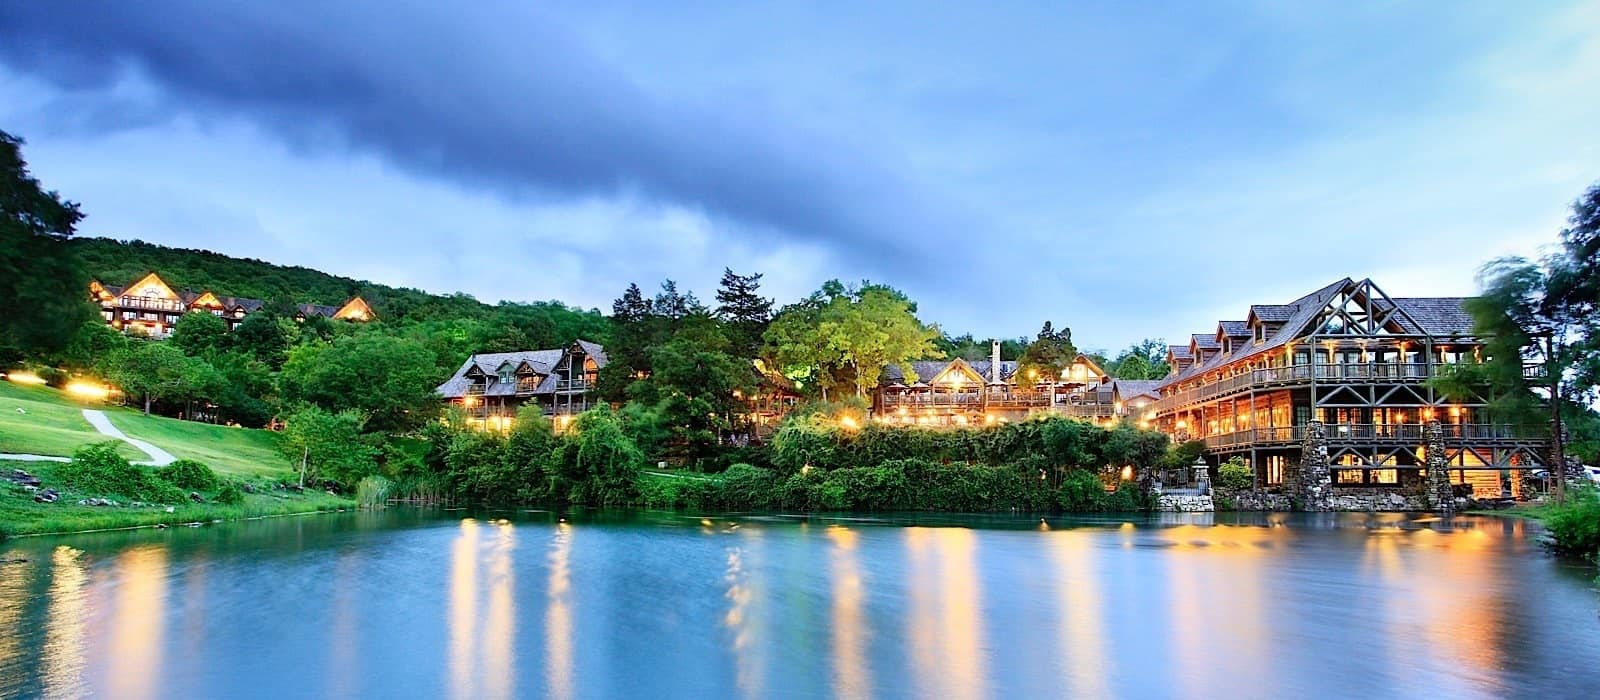 Missouri S Big Cedar Lodge Rustic Elegance In A